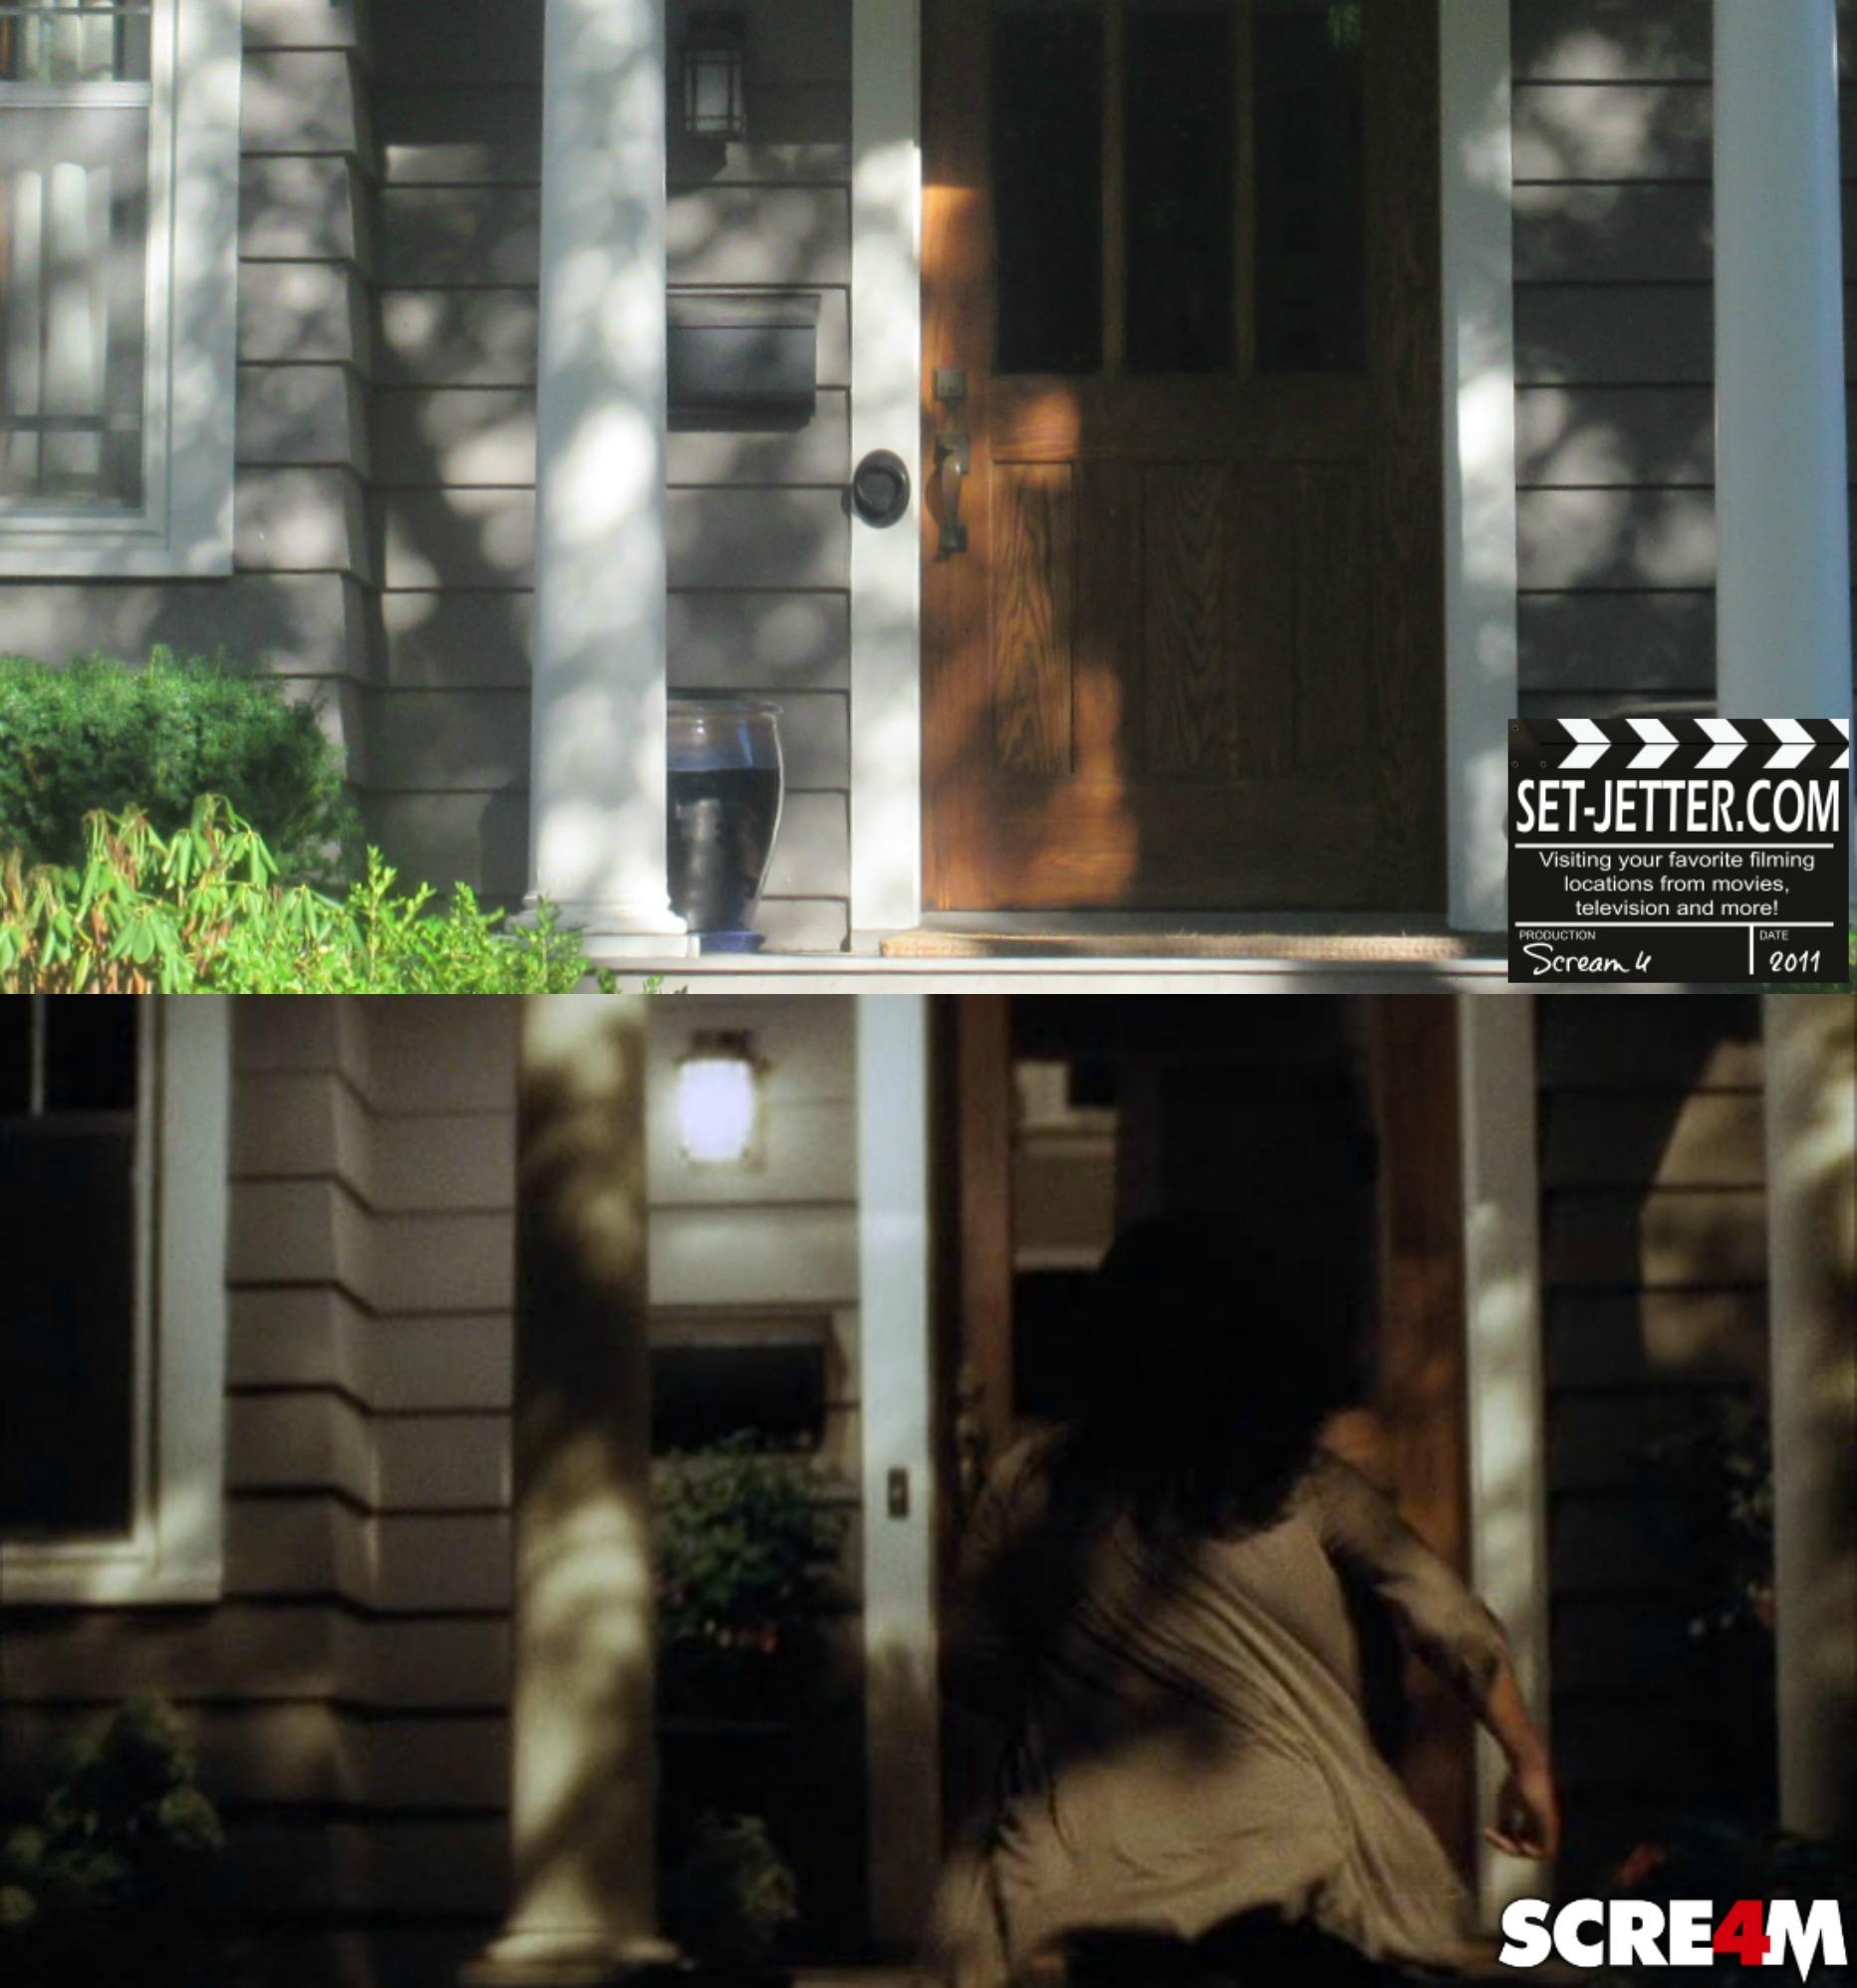 Scream4 comparison 119.jpg